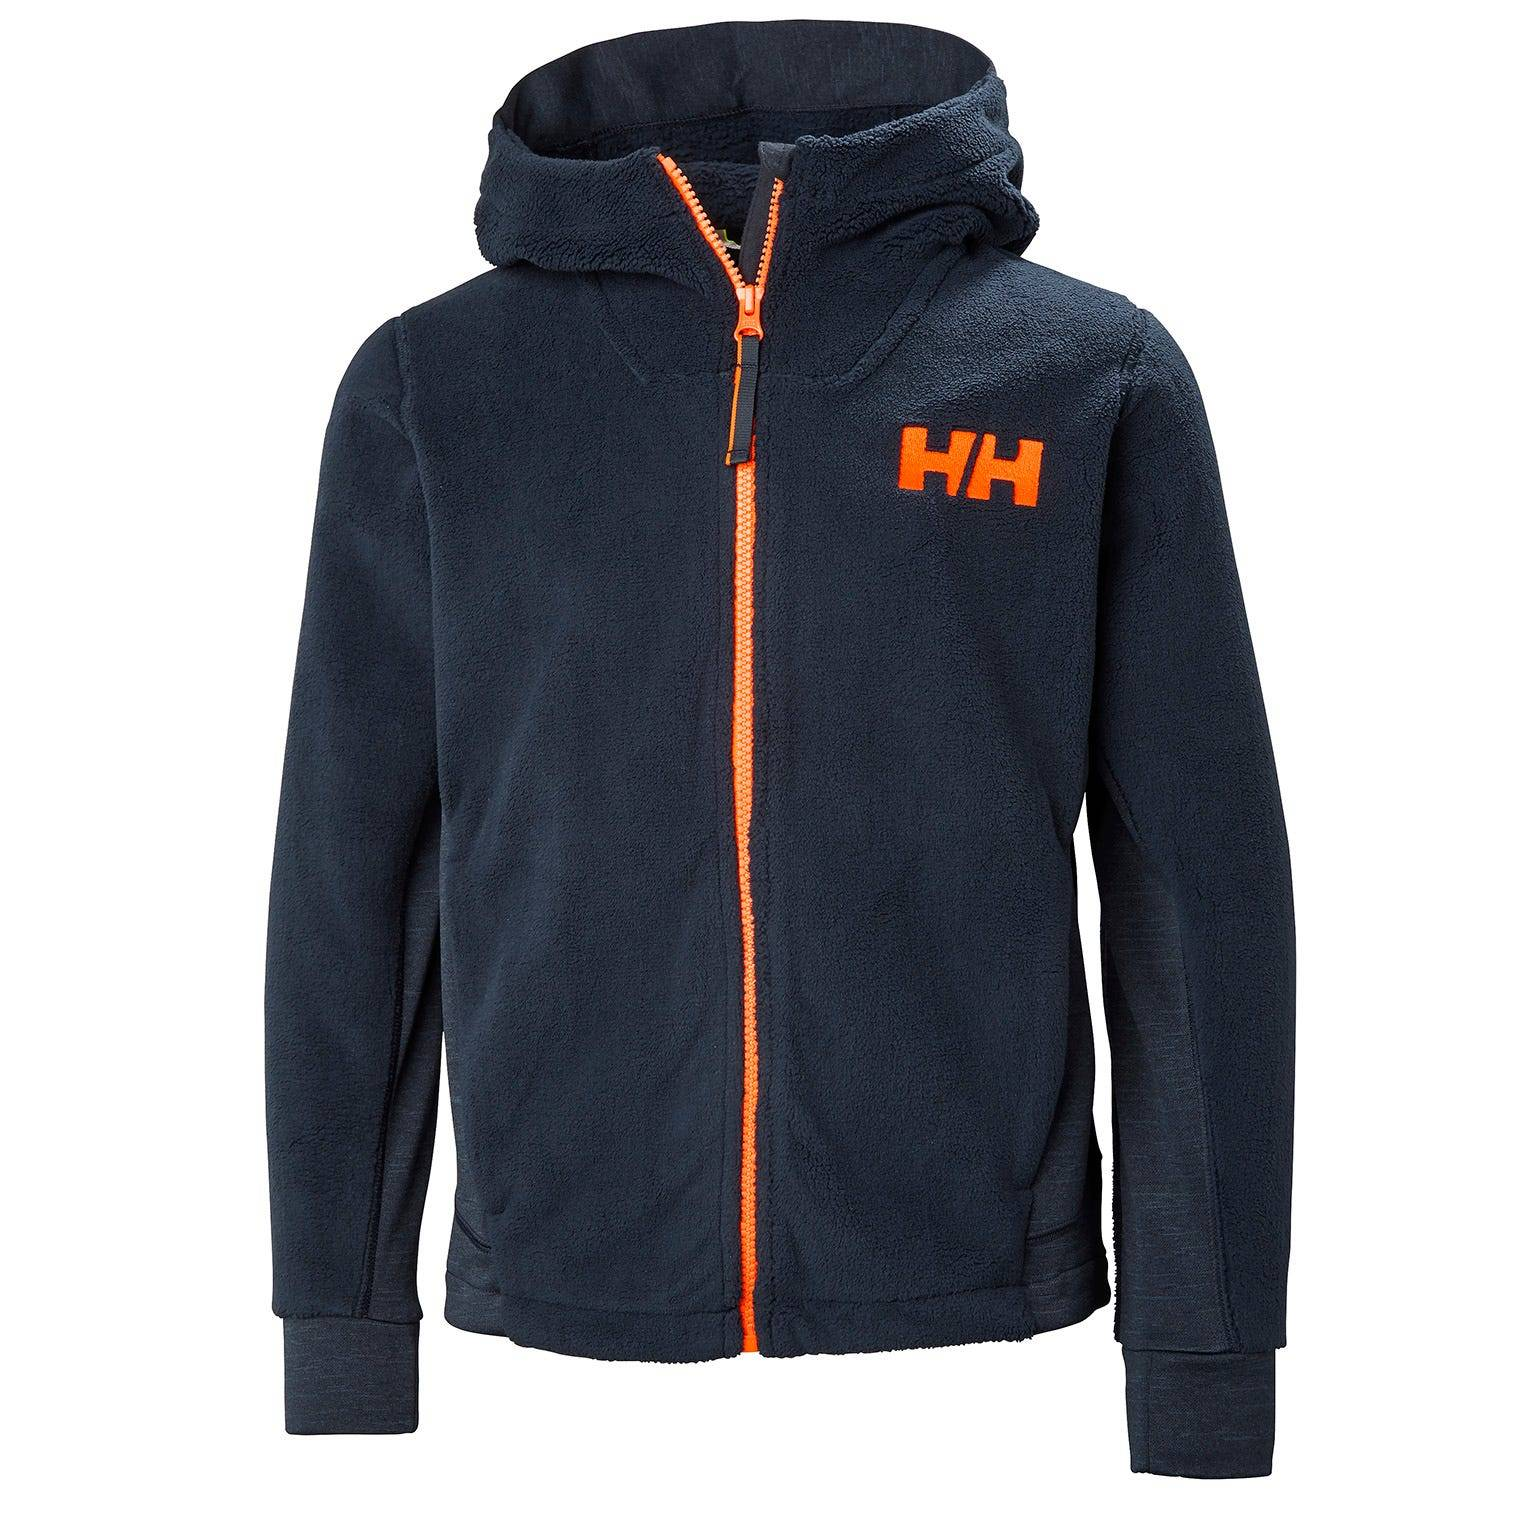 Helly Hansen Junior Chill Fz Hoodie Kids Fleece Navy 140/10